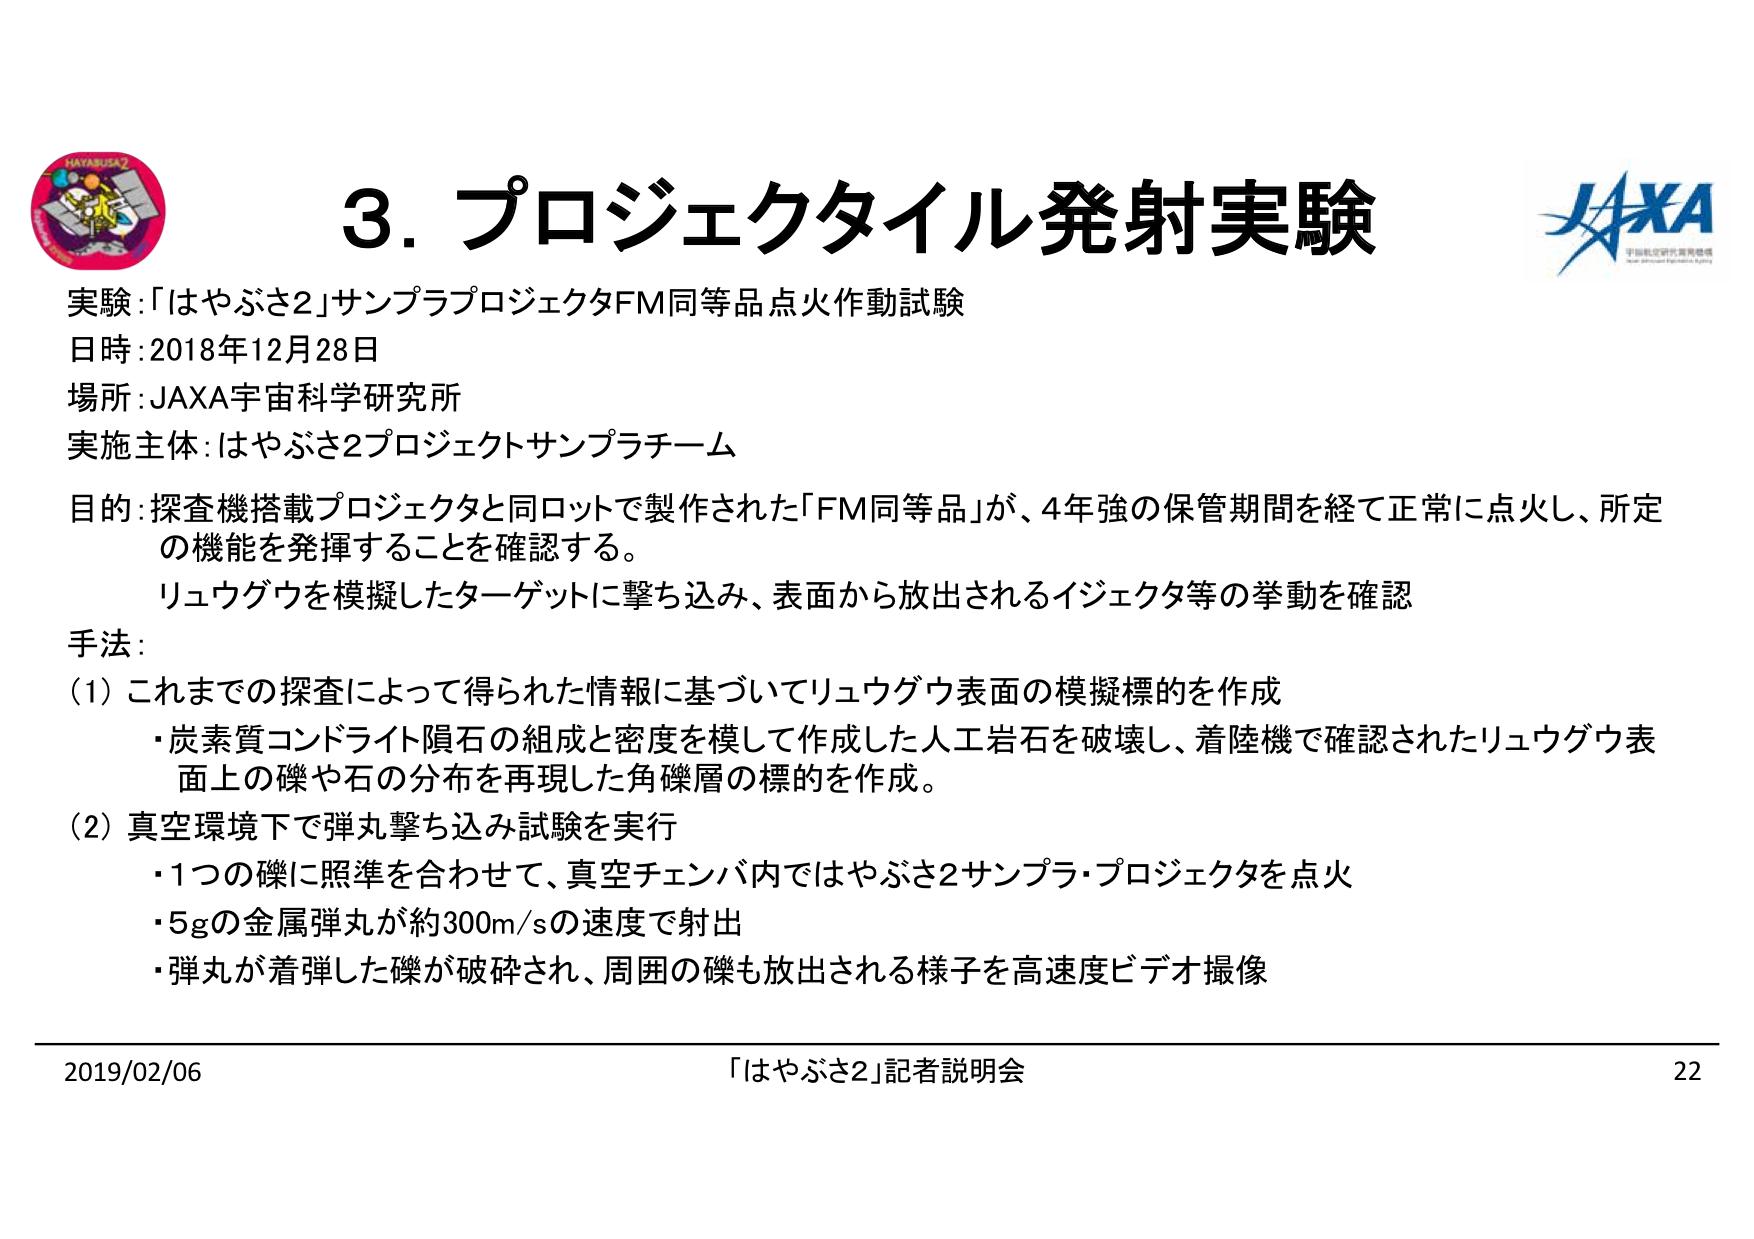 f:id:Imamura:20190204175516p:plain